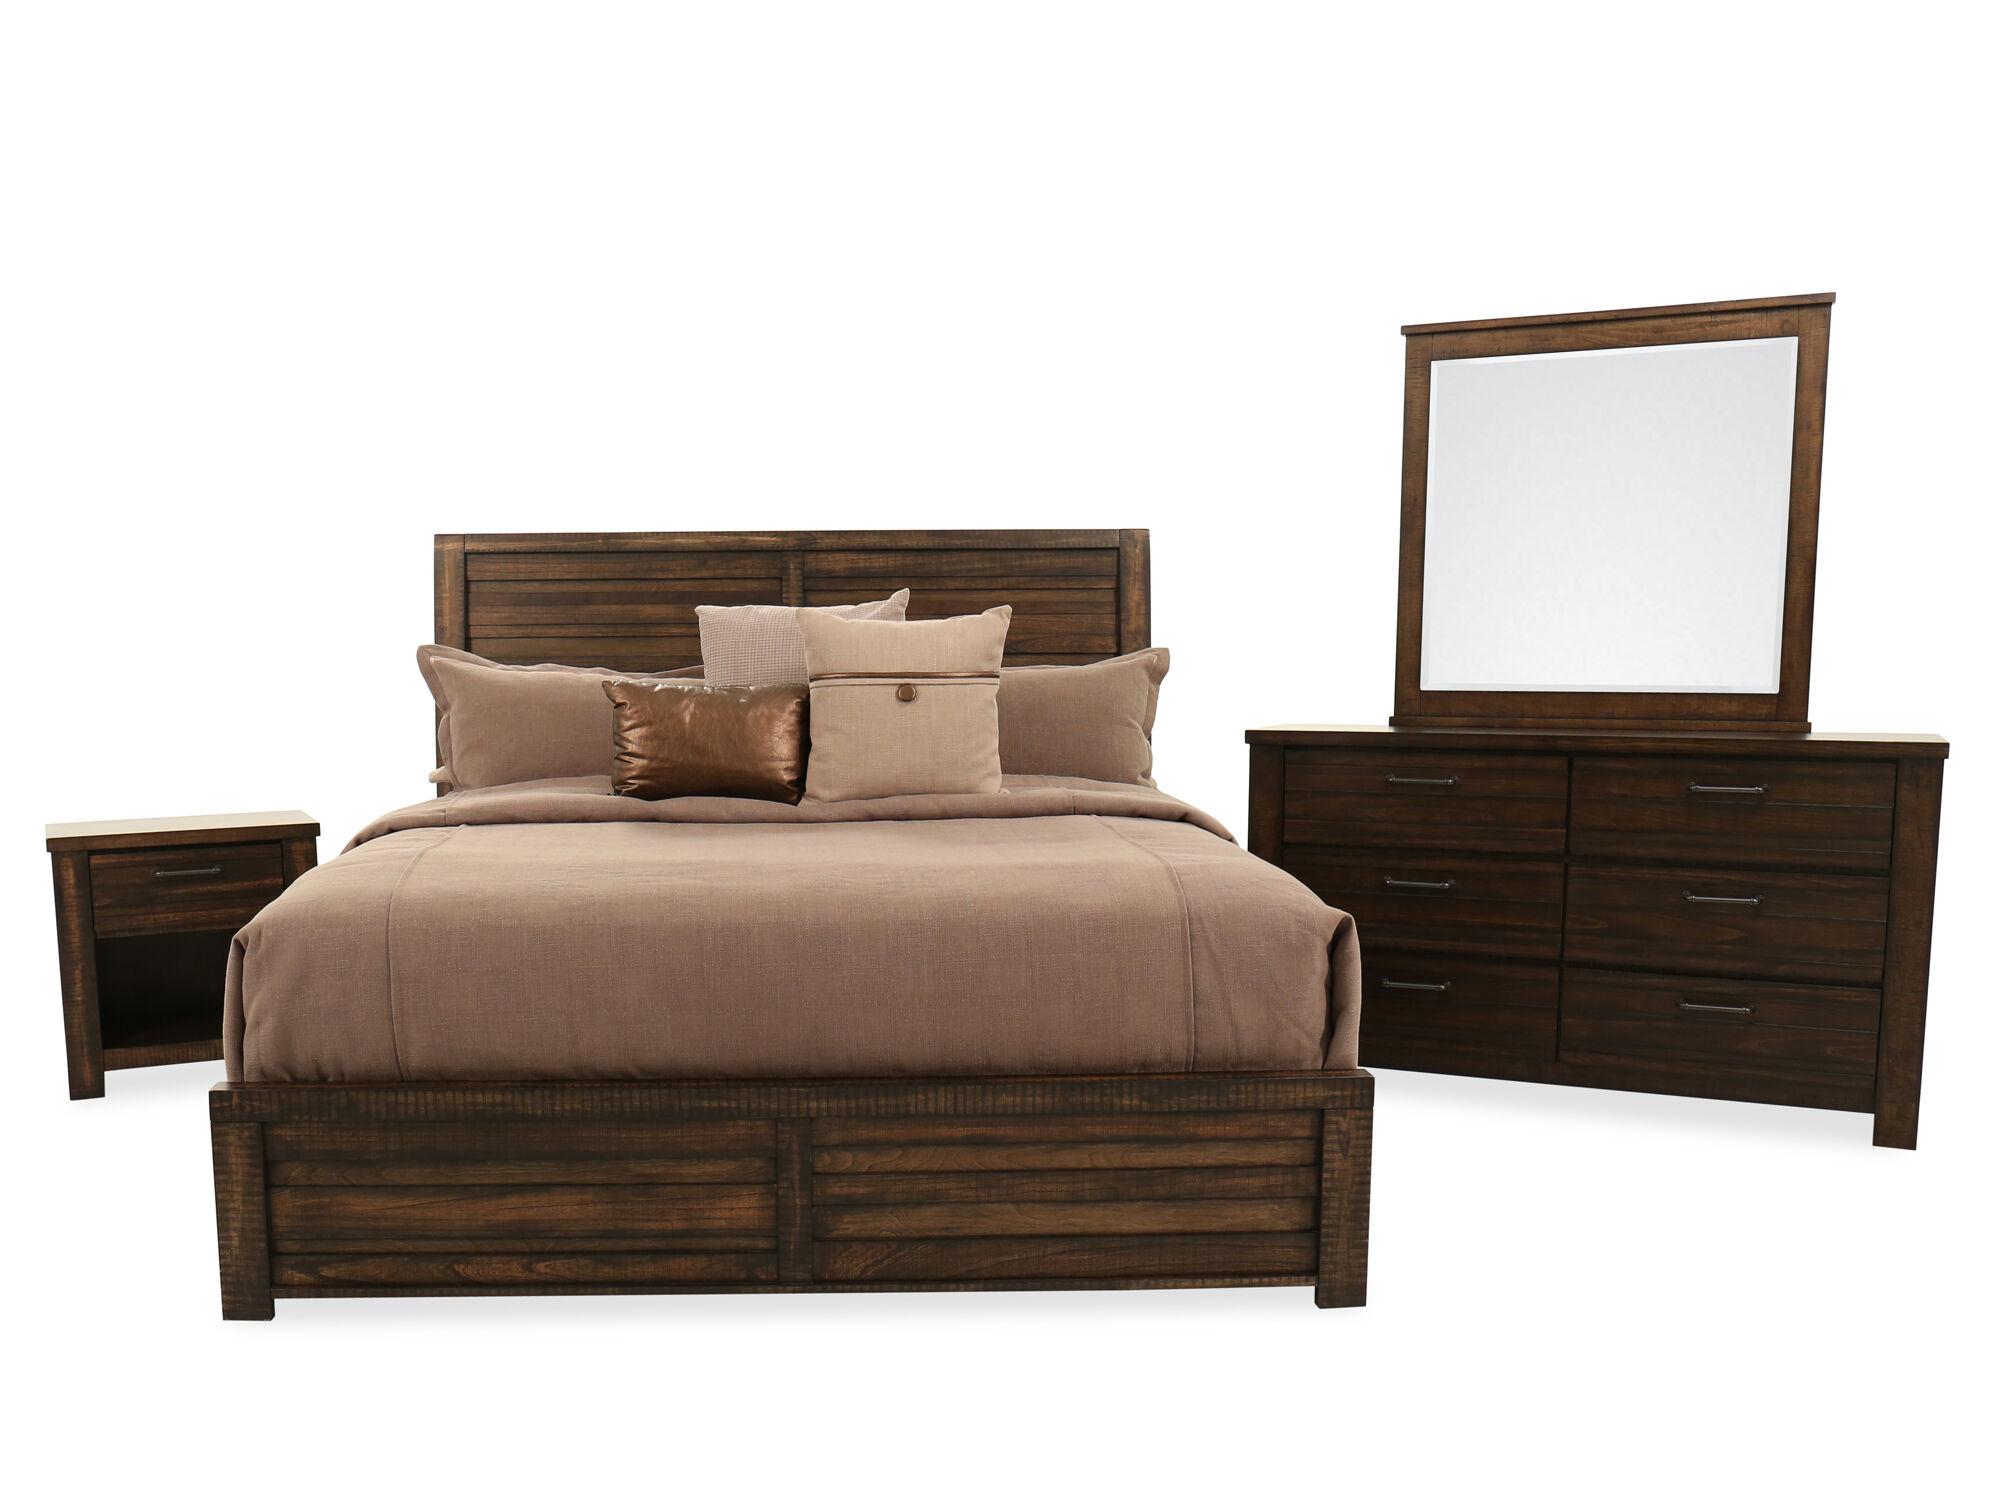 Four Piece Traditional Queen Bedroom Suite In Tobacco ...